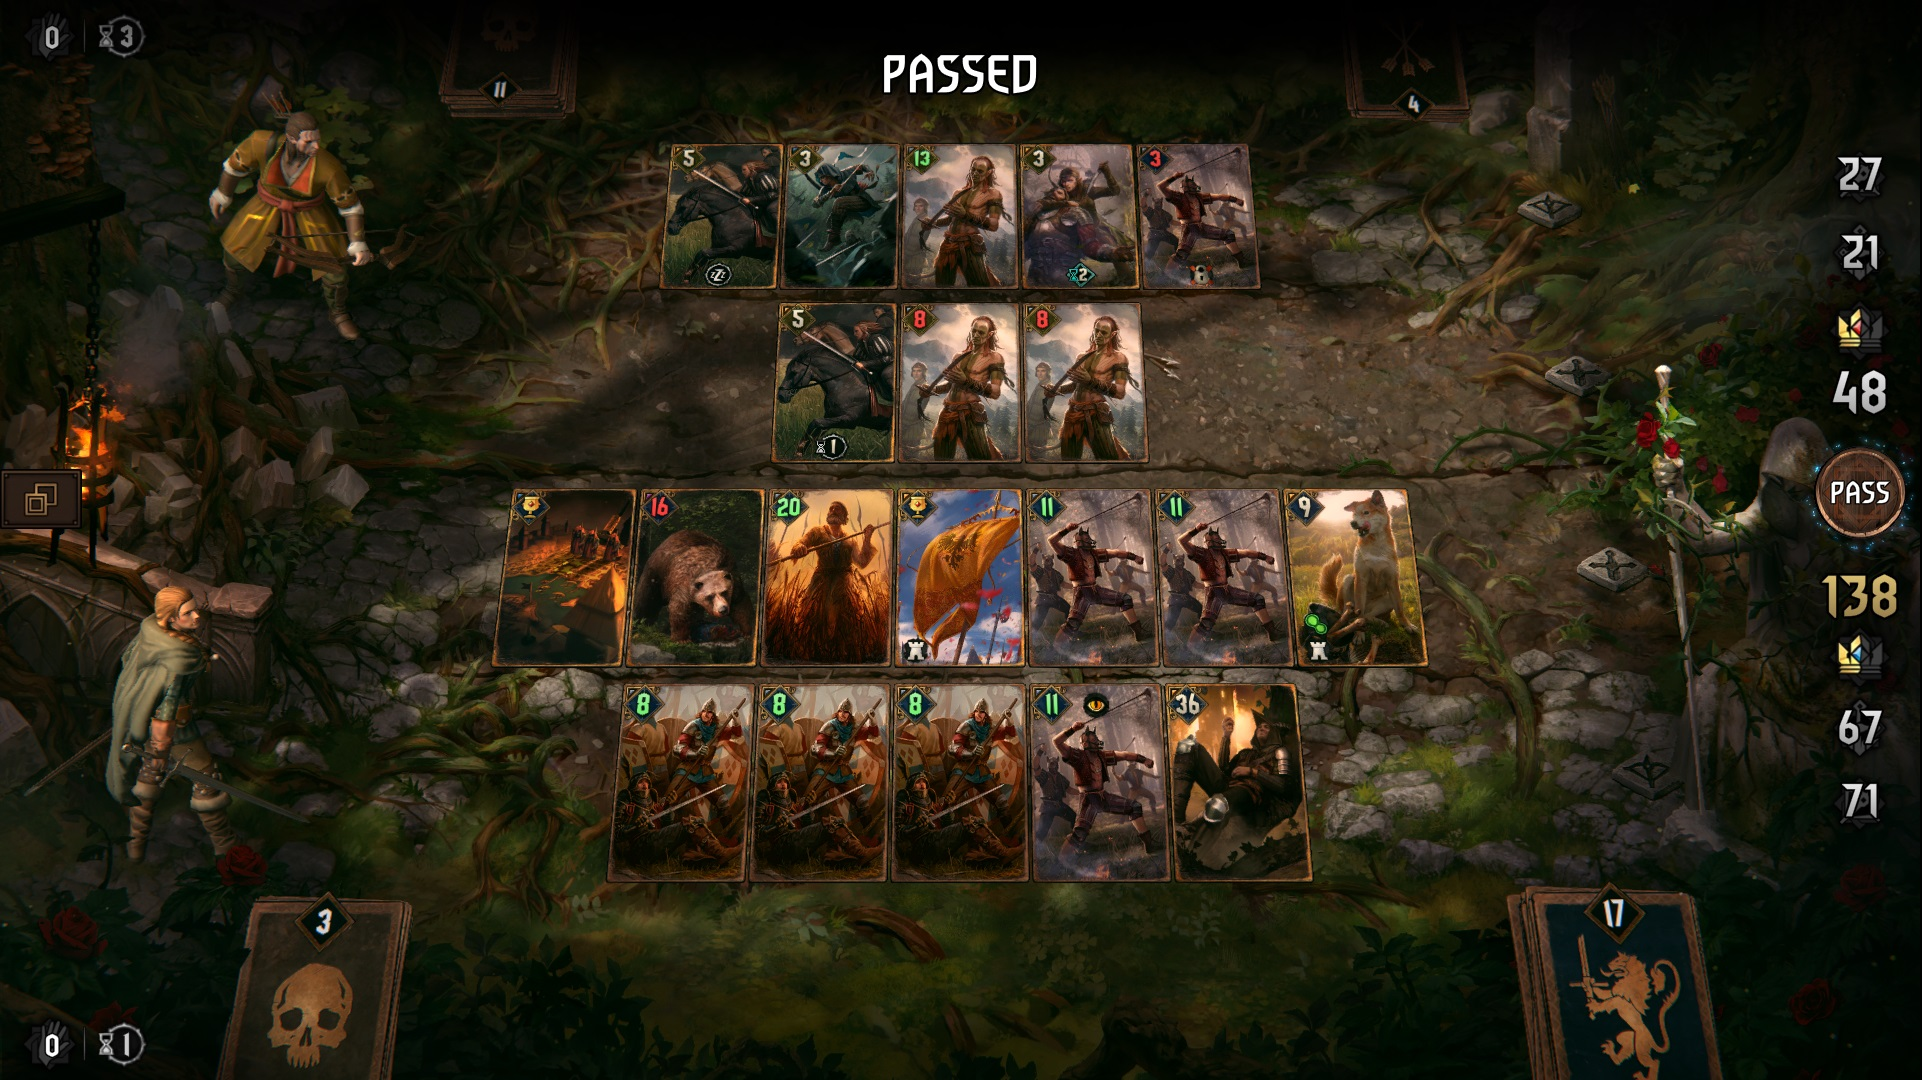 بازی Thronebreaker: The Witcher Tales